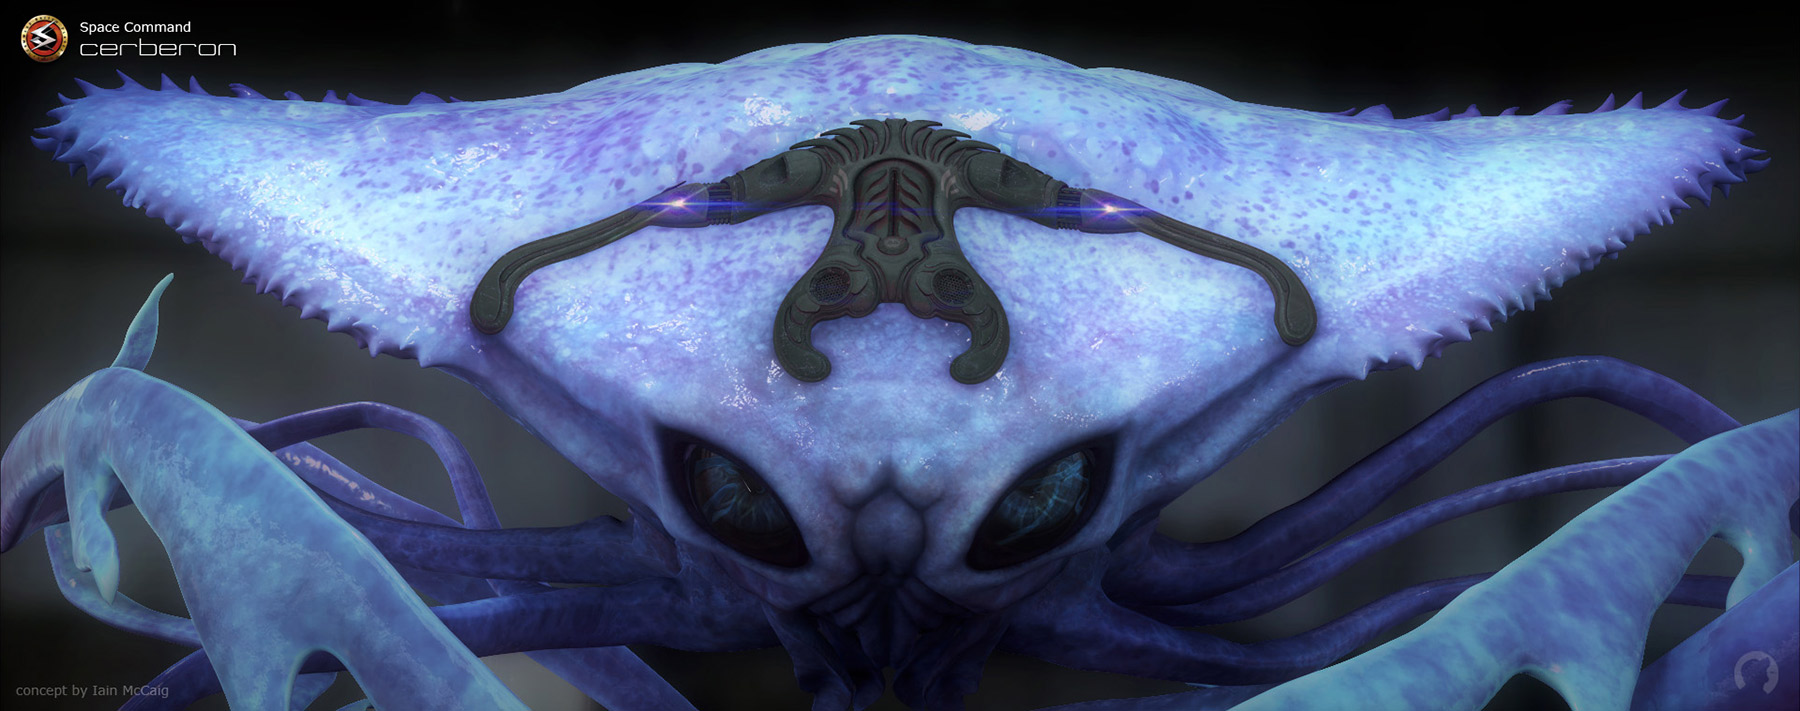 3d alien babes hentai galleries